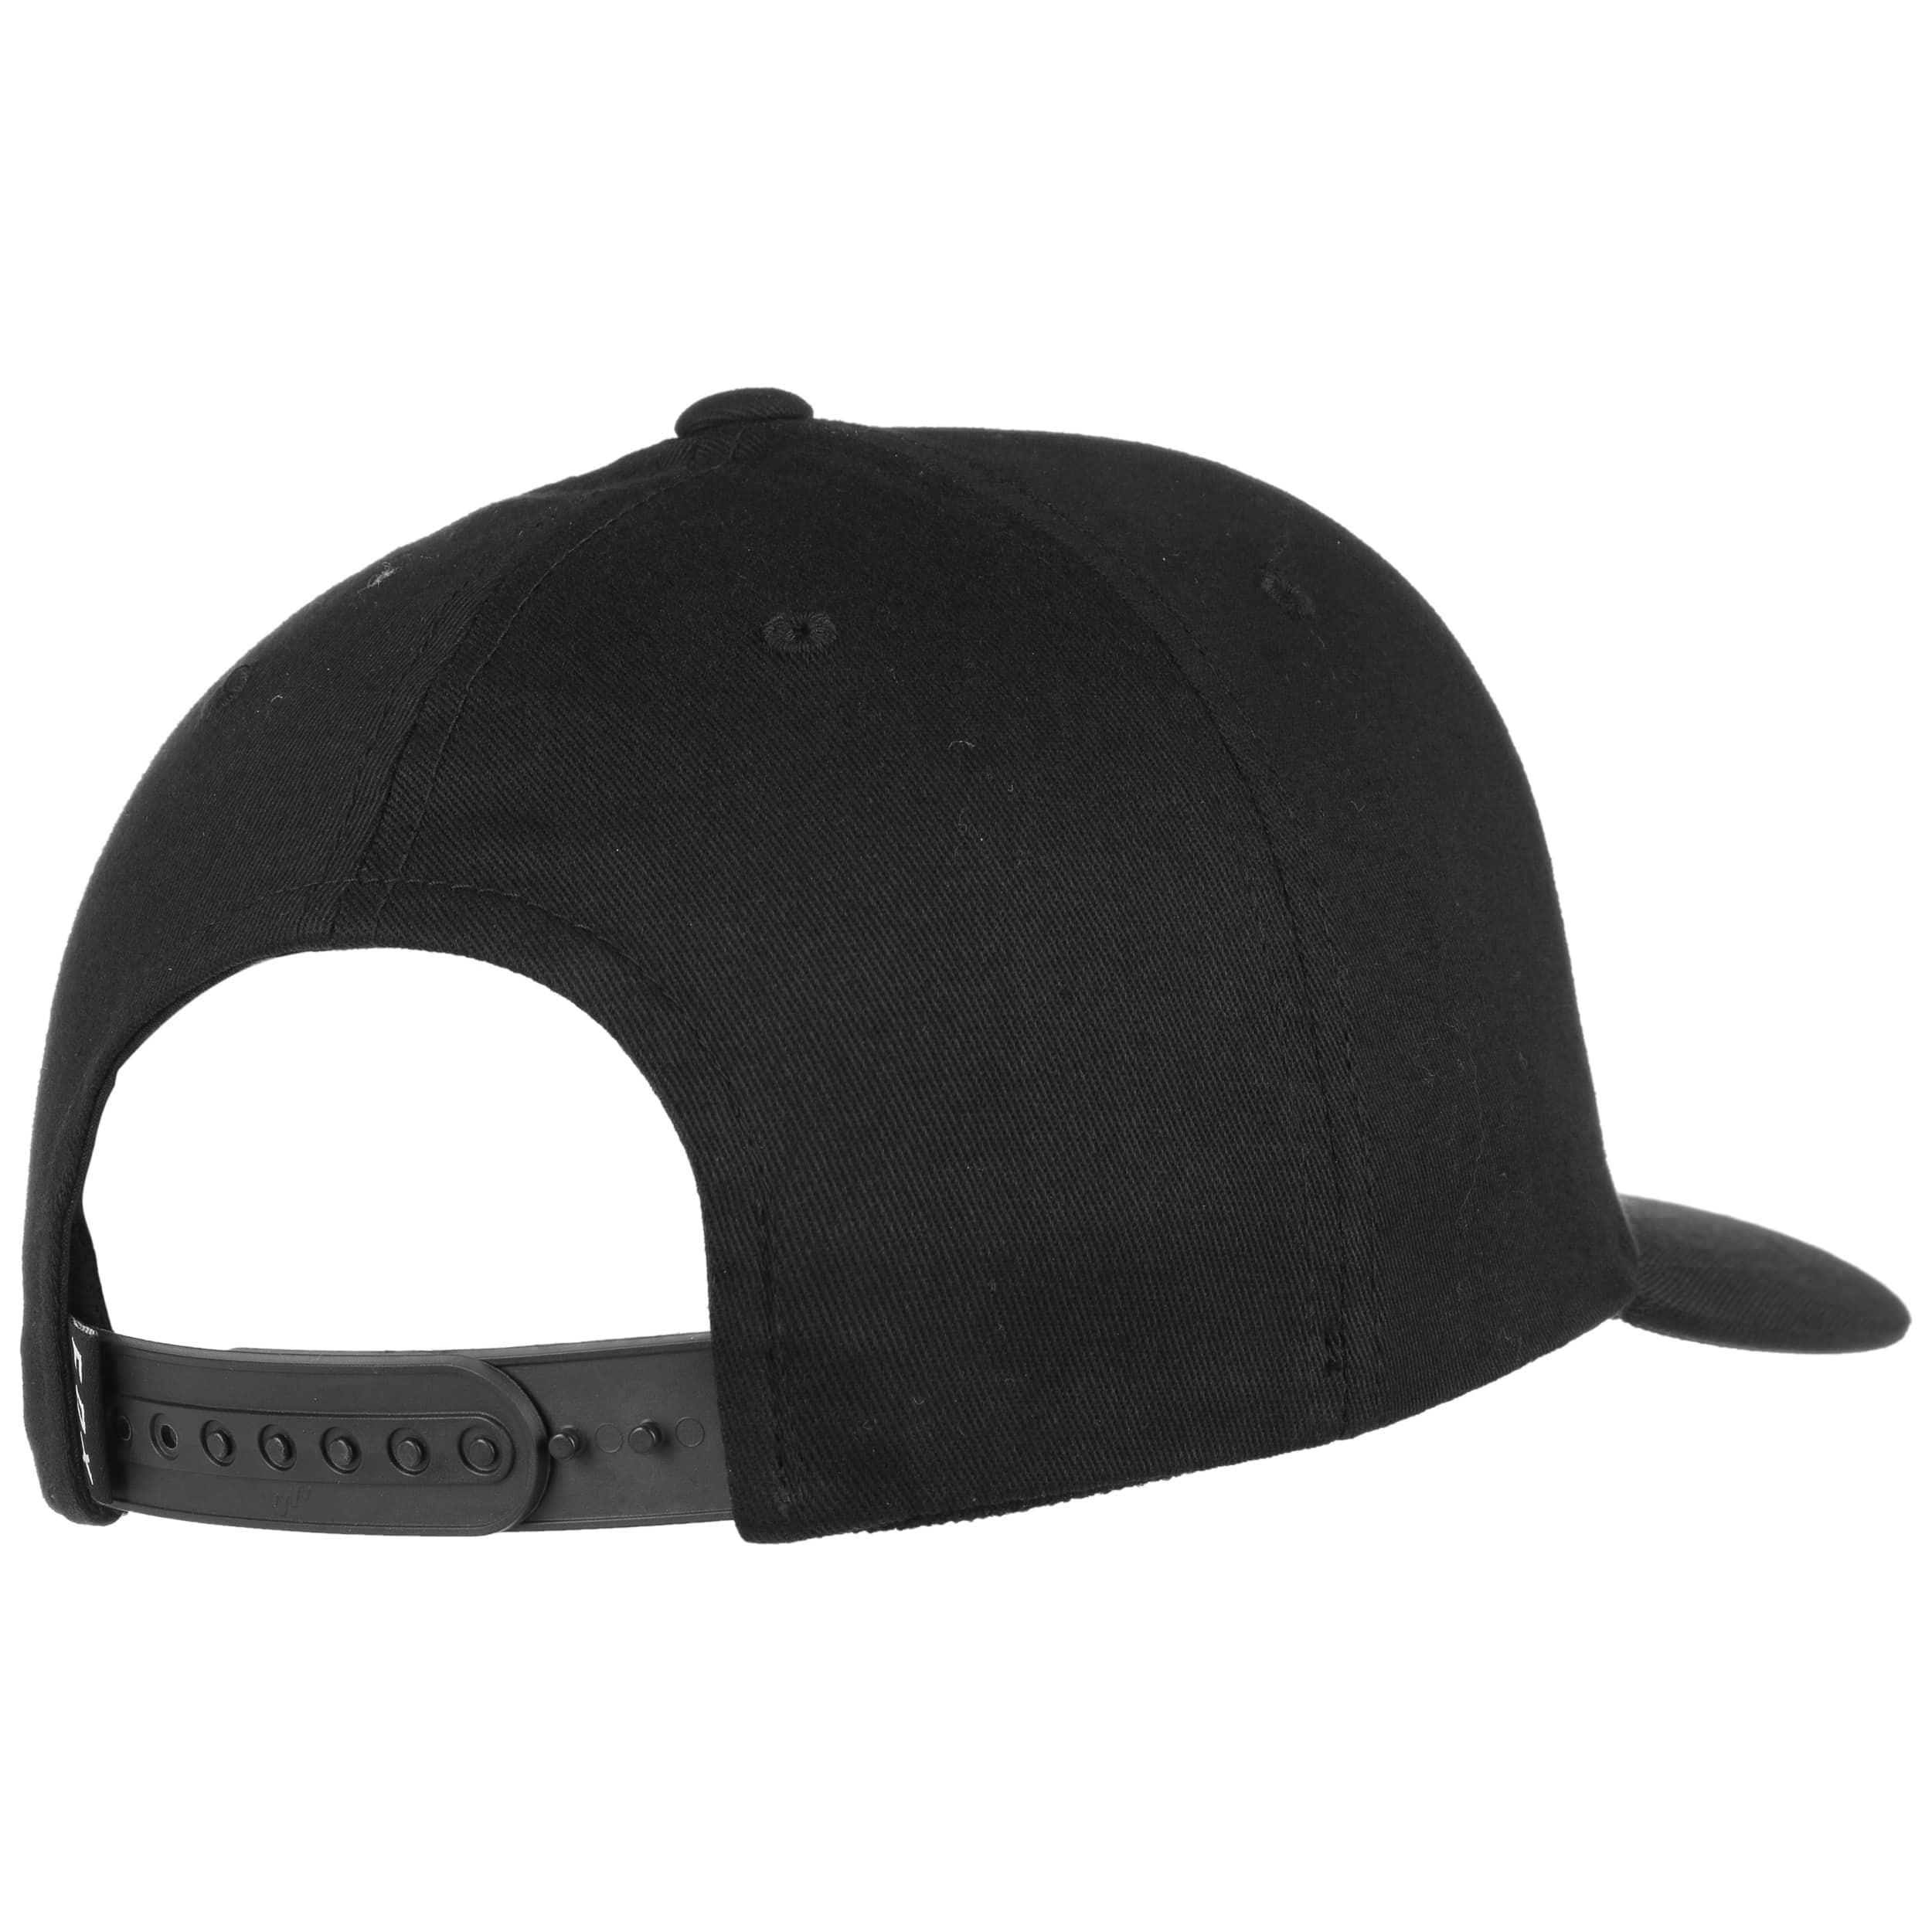 ... Logo 110 Snapback Cap by FOX - black 3 ... cd6ea686ec9